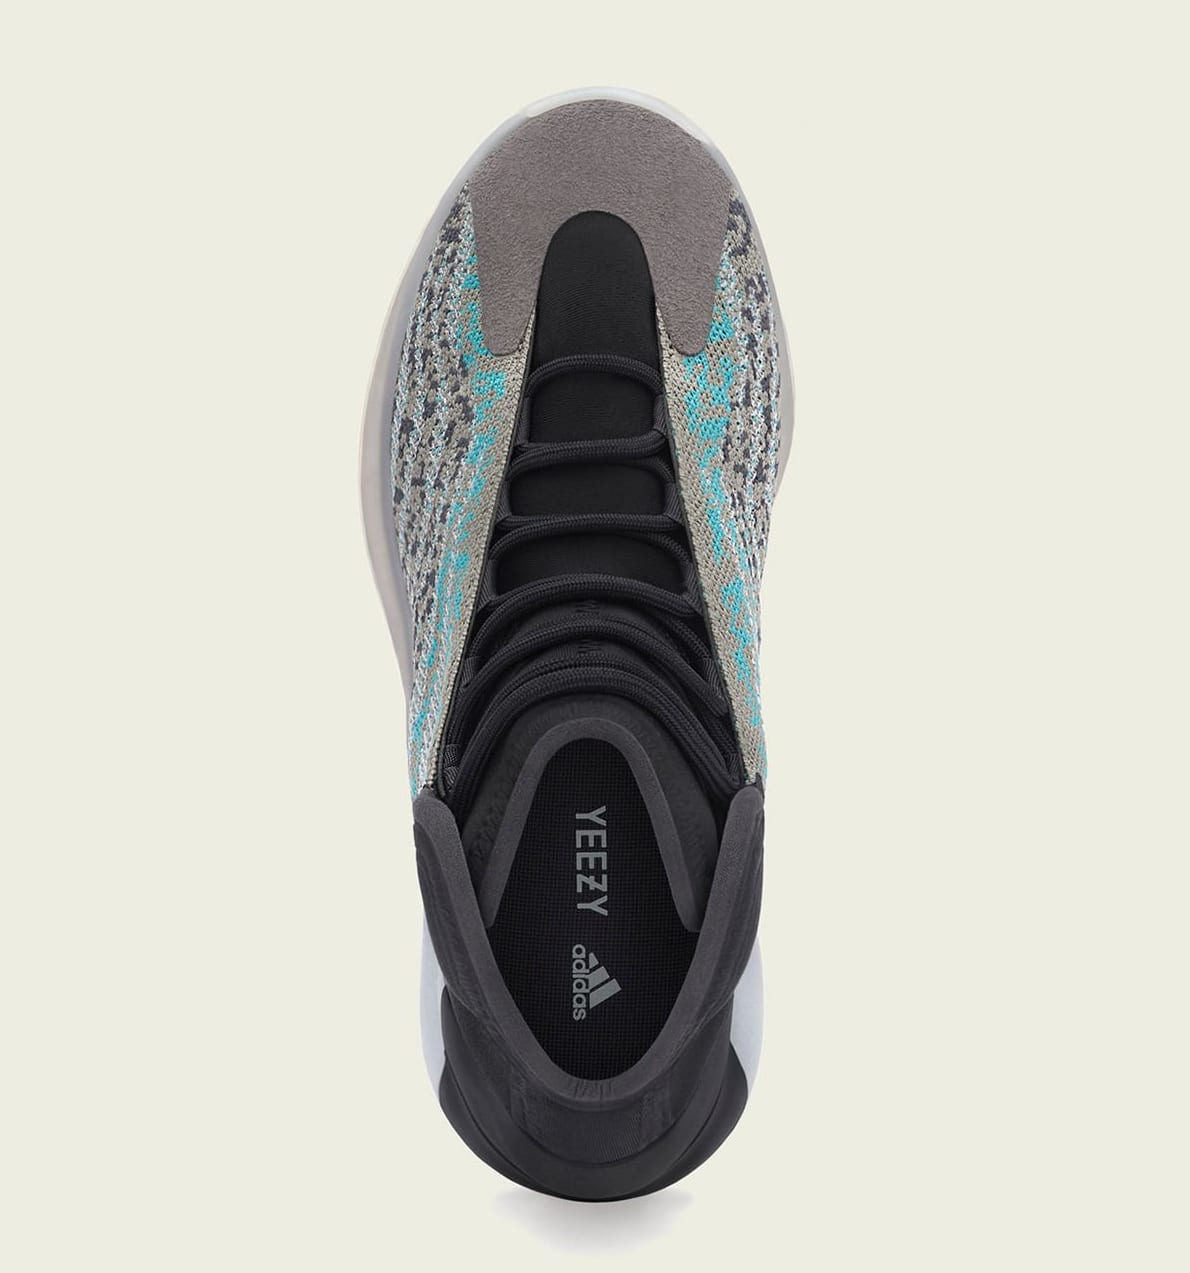 Adidas Yeezy QNTM 'Teal Blue' G58864 Top